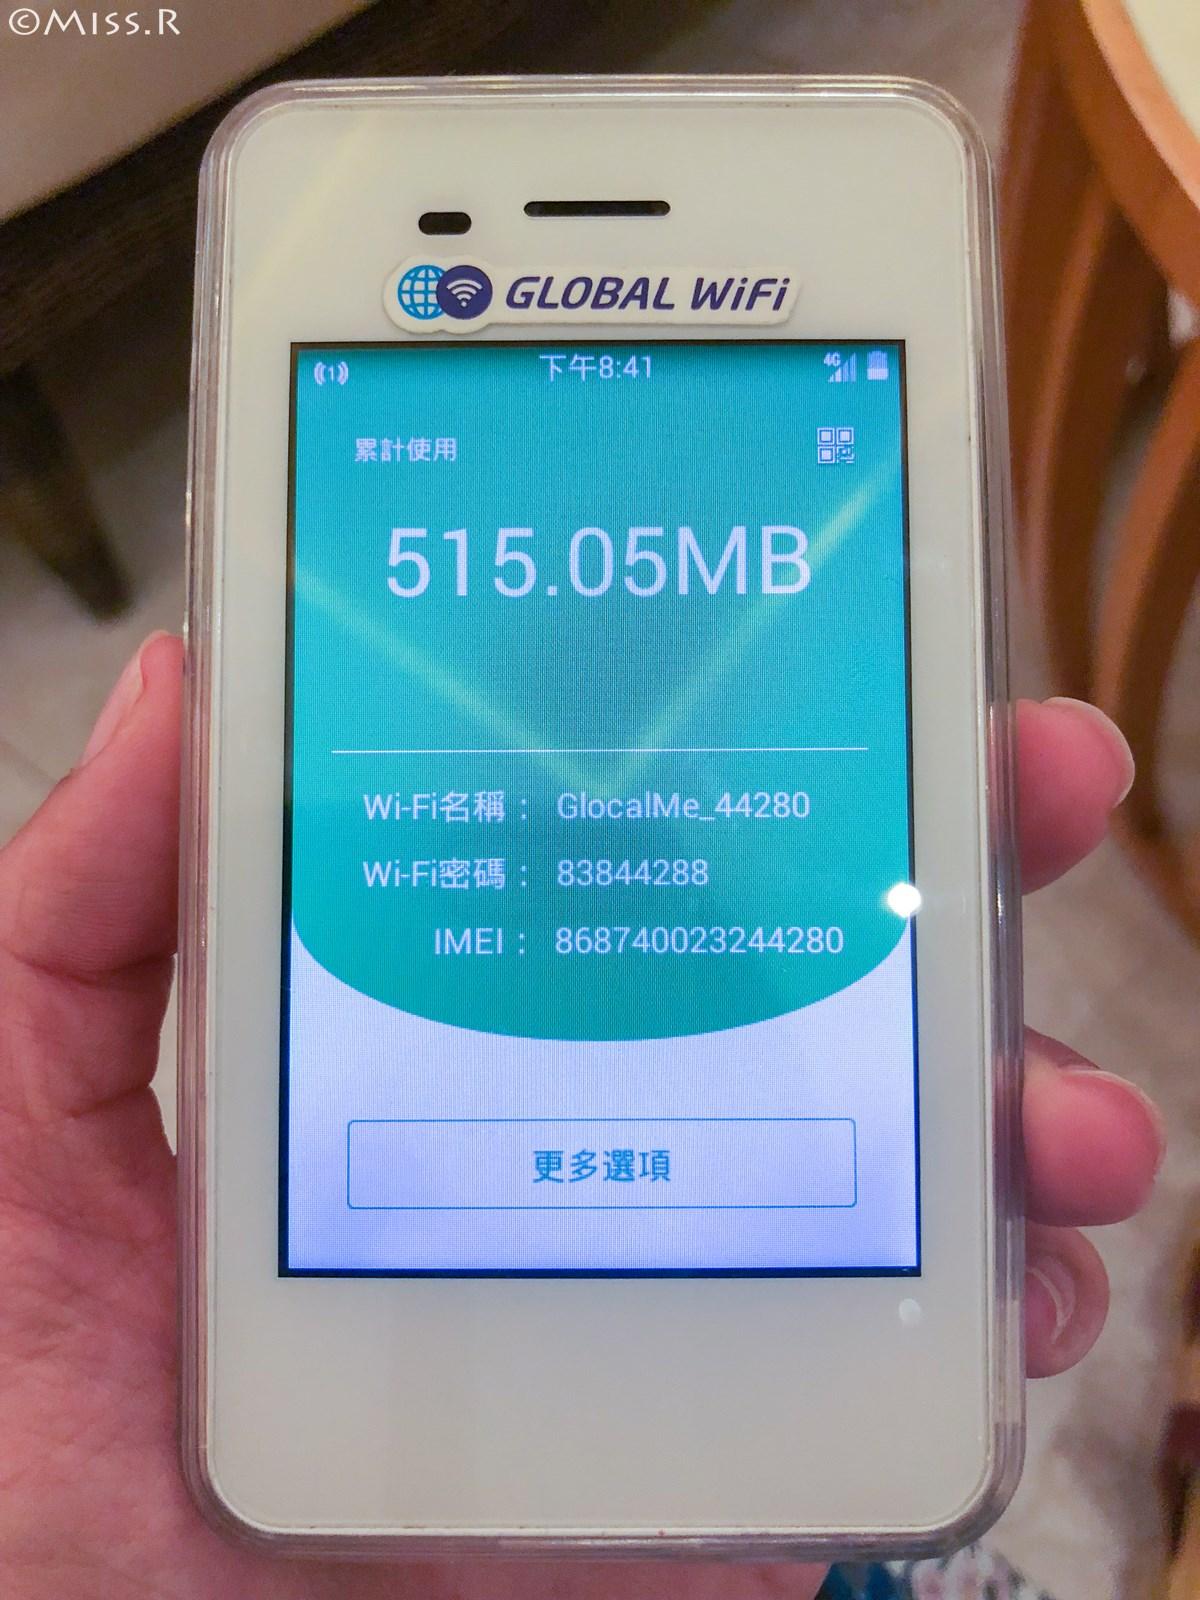 """globalwifi,長灘島上網,長灘島sim卡,長灘島wifi推薦,長灘島訊號,globalwifi優惠,globalwifi上網"""